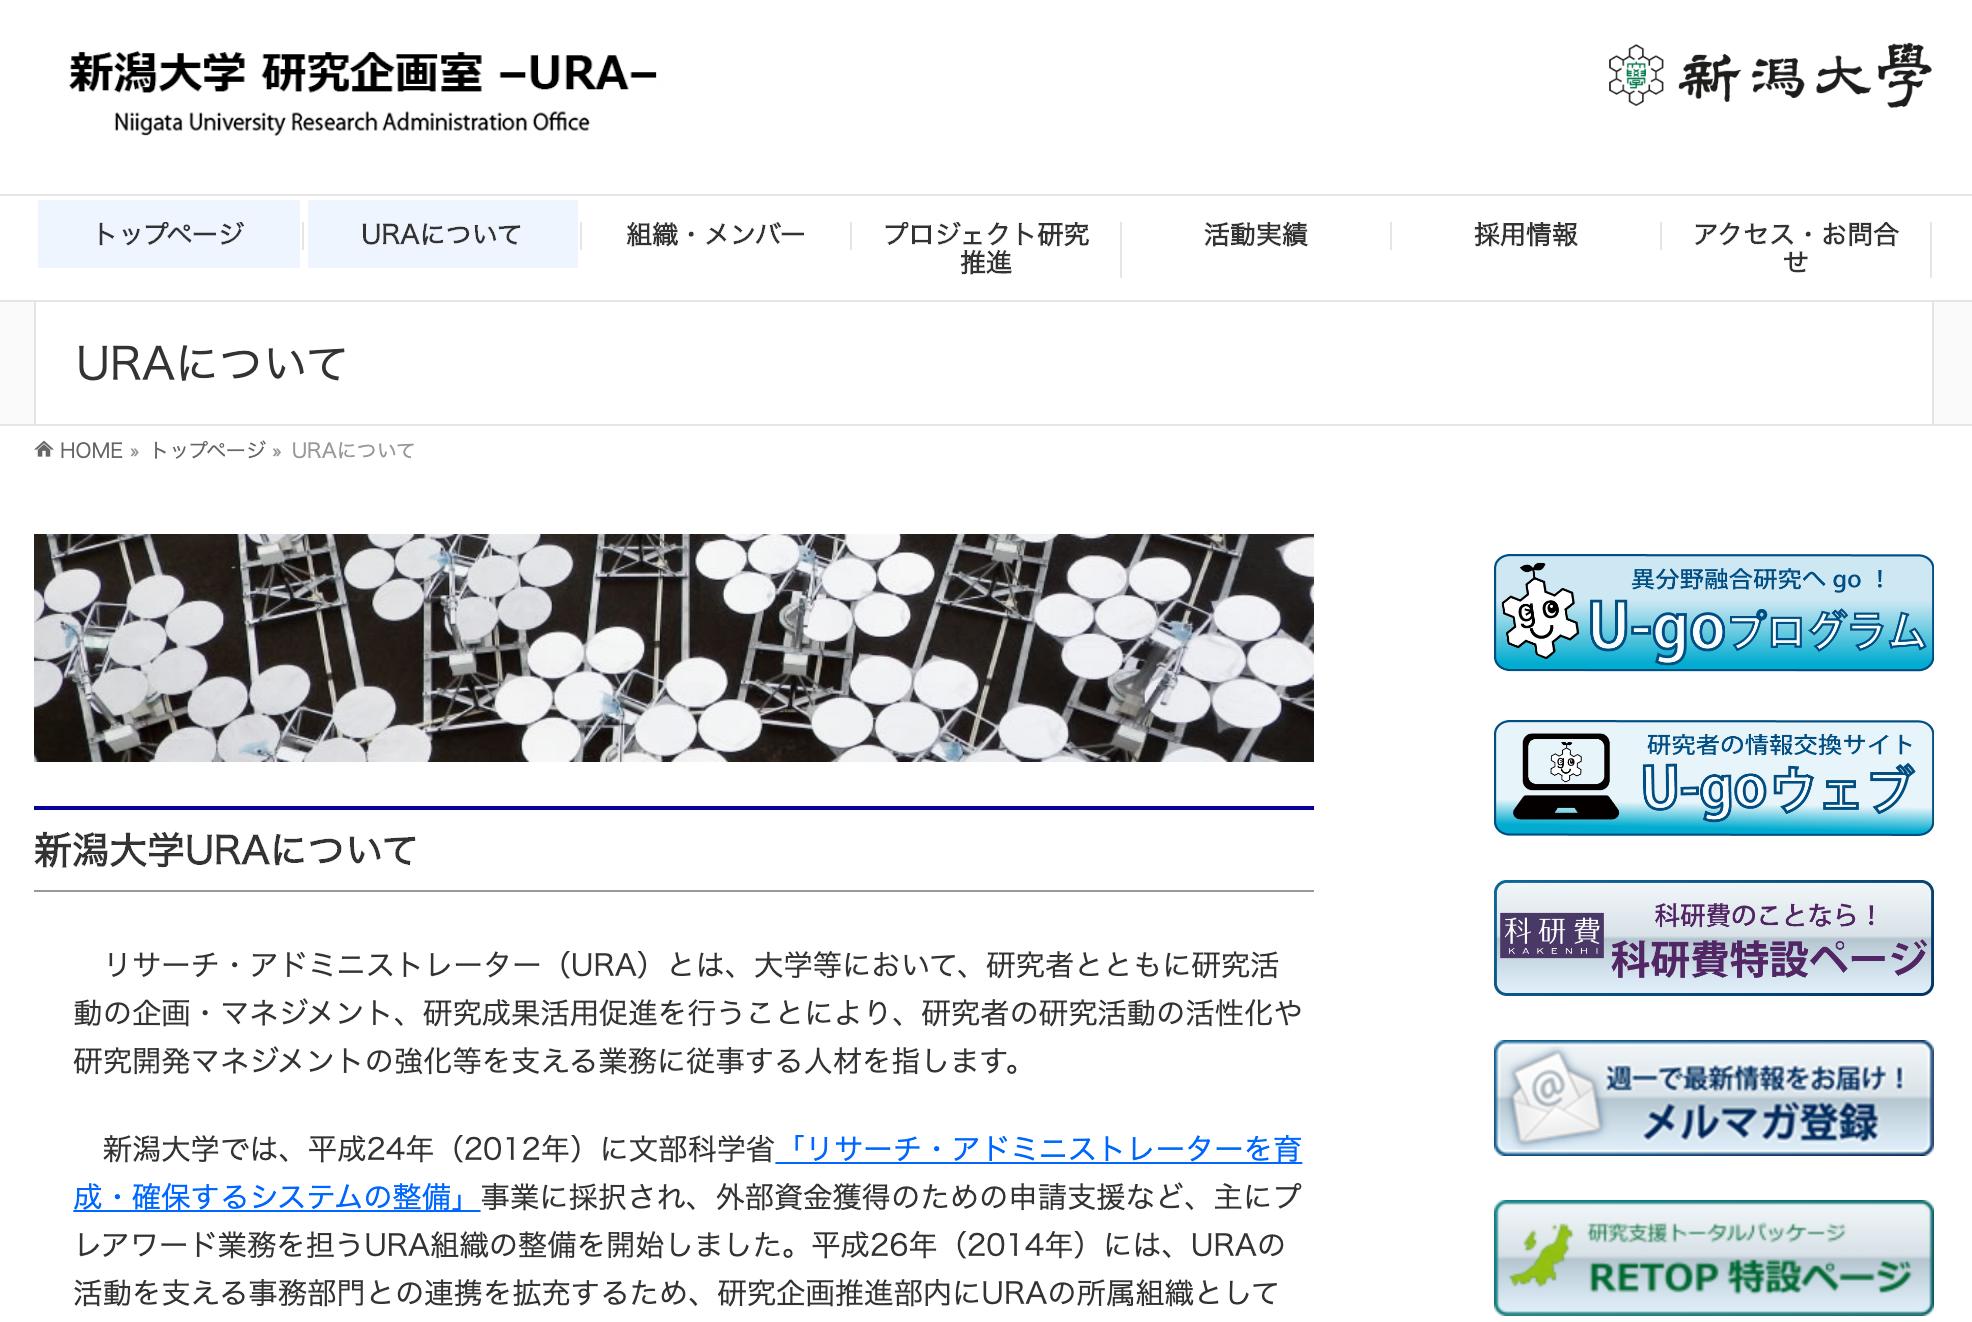 URA 新潟大学研究企画室 - www.ura.niigata-u.ac.jp